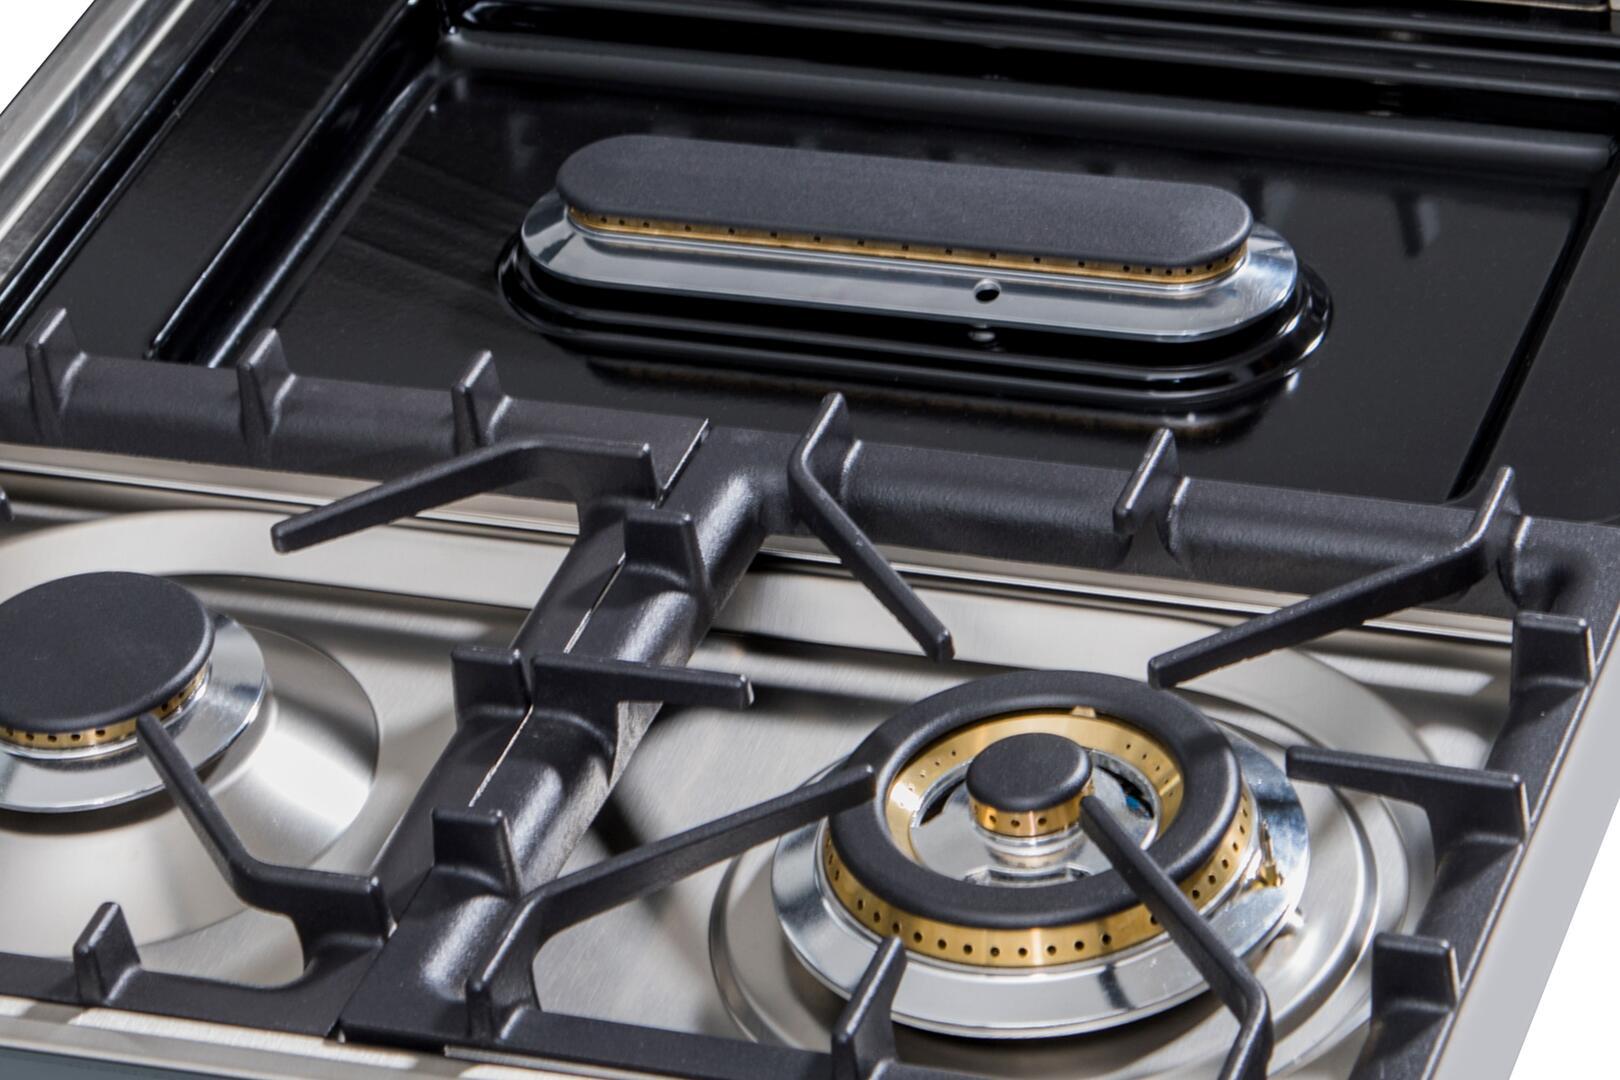 Ilve  UXLP90FI Gas Cooktop Stainless Steel, UXLP90FI Lifestyle